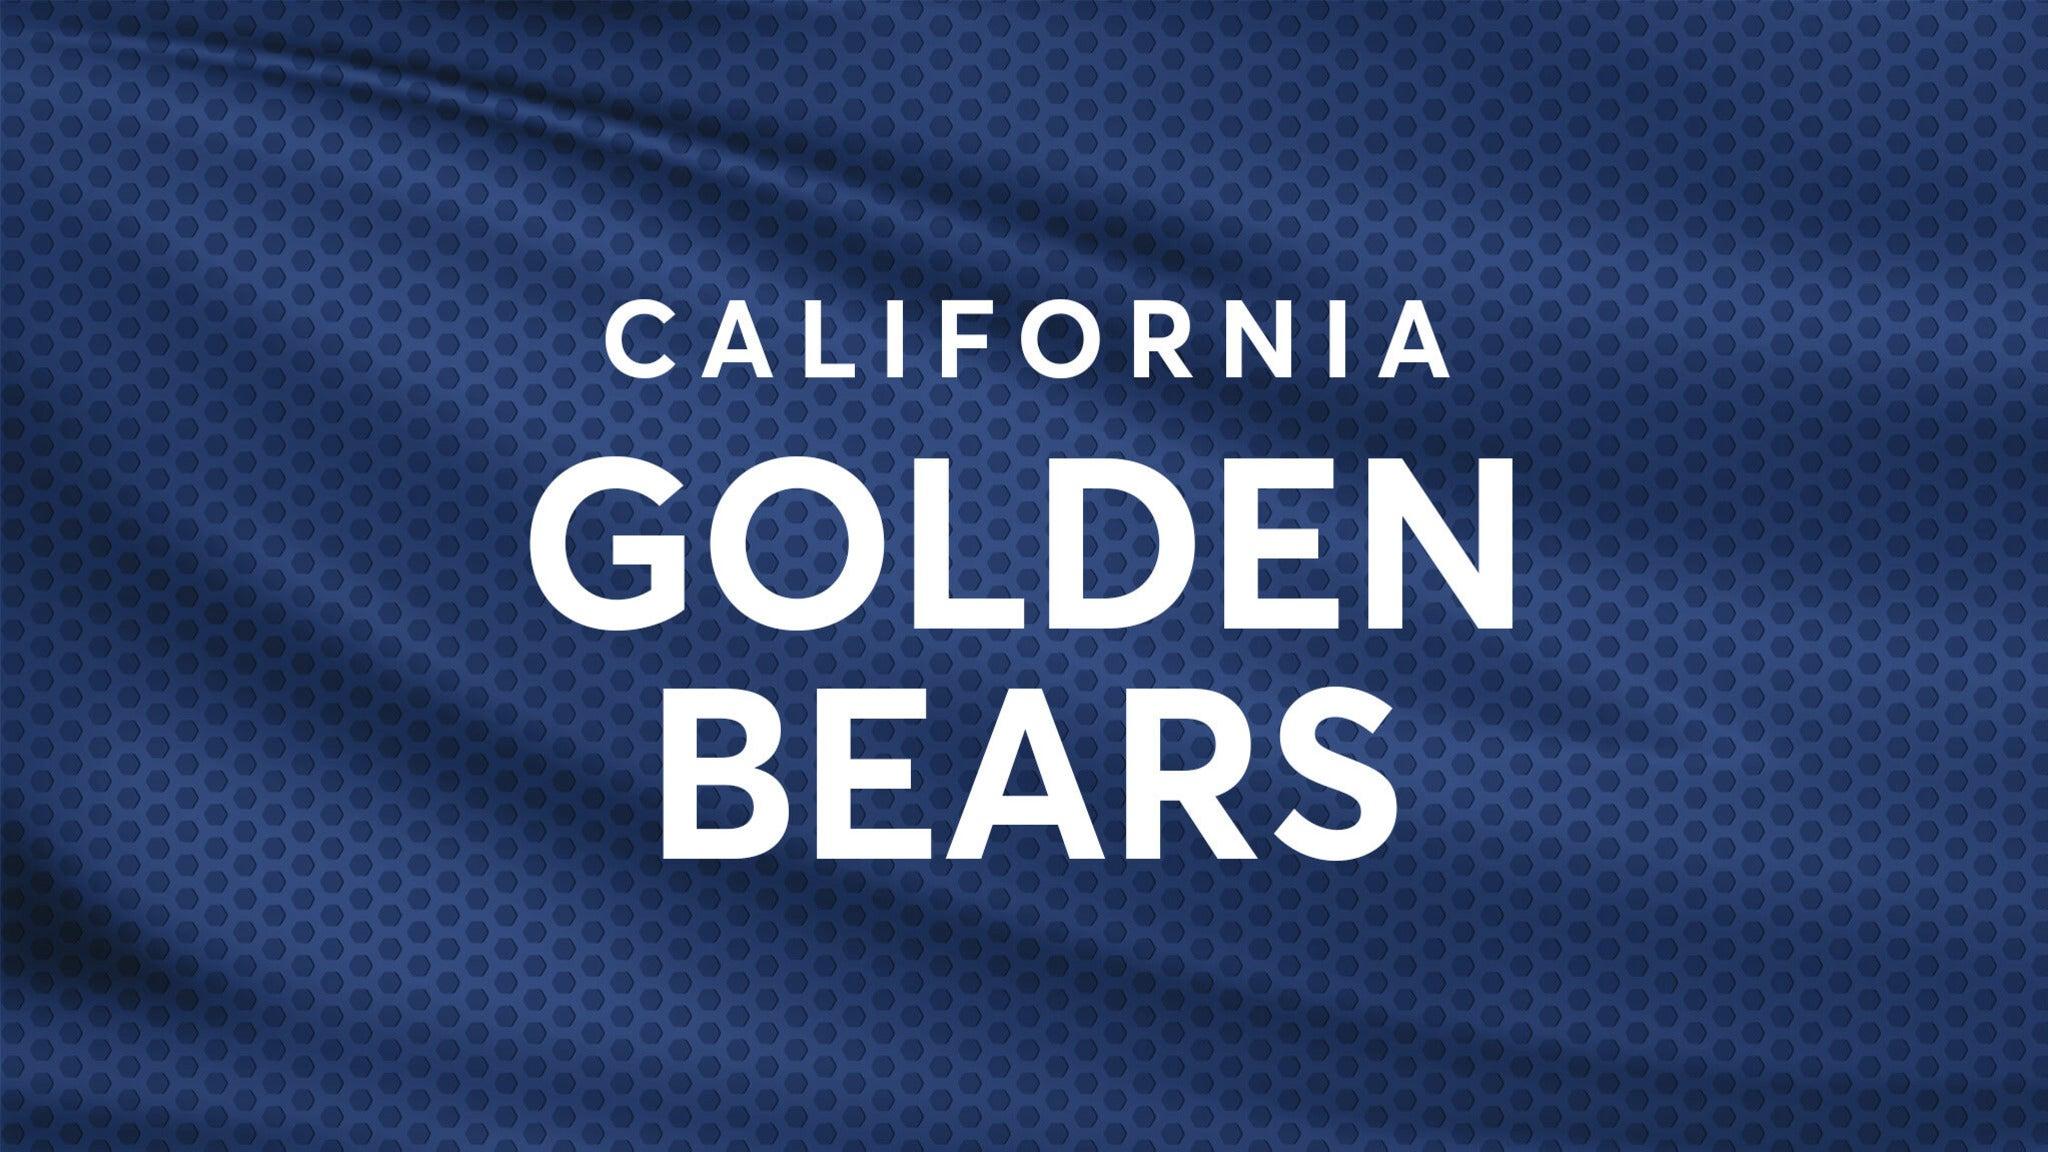 California Golden Bears Mens Basketball